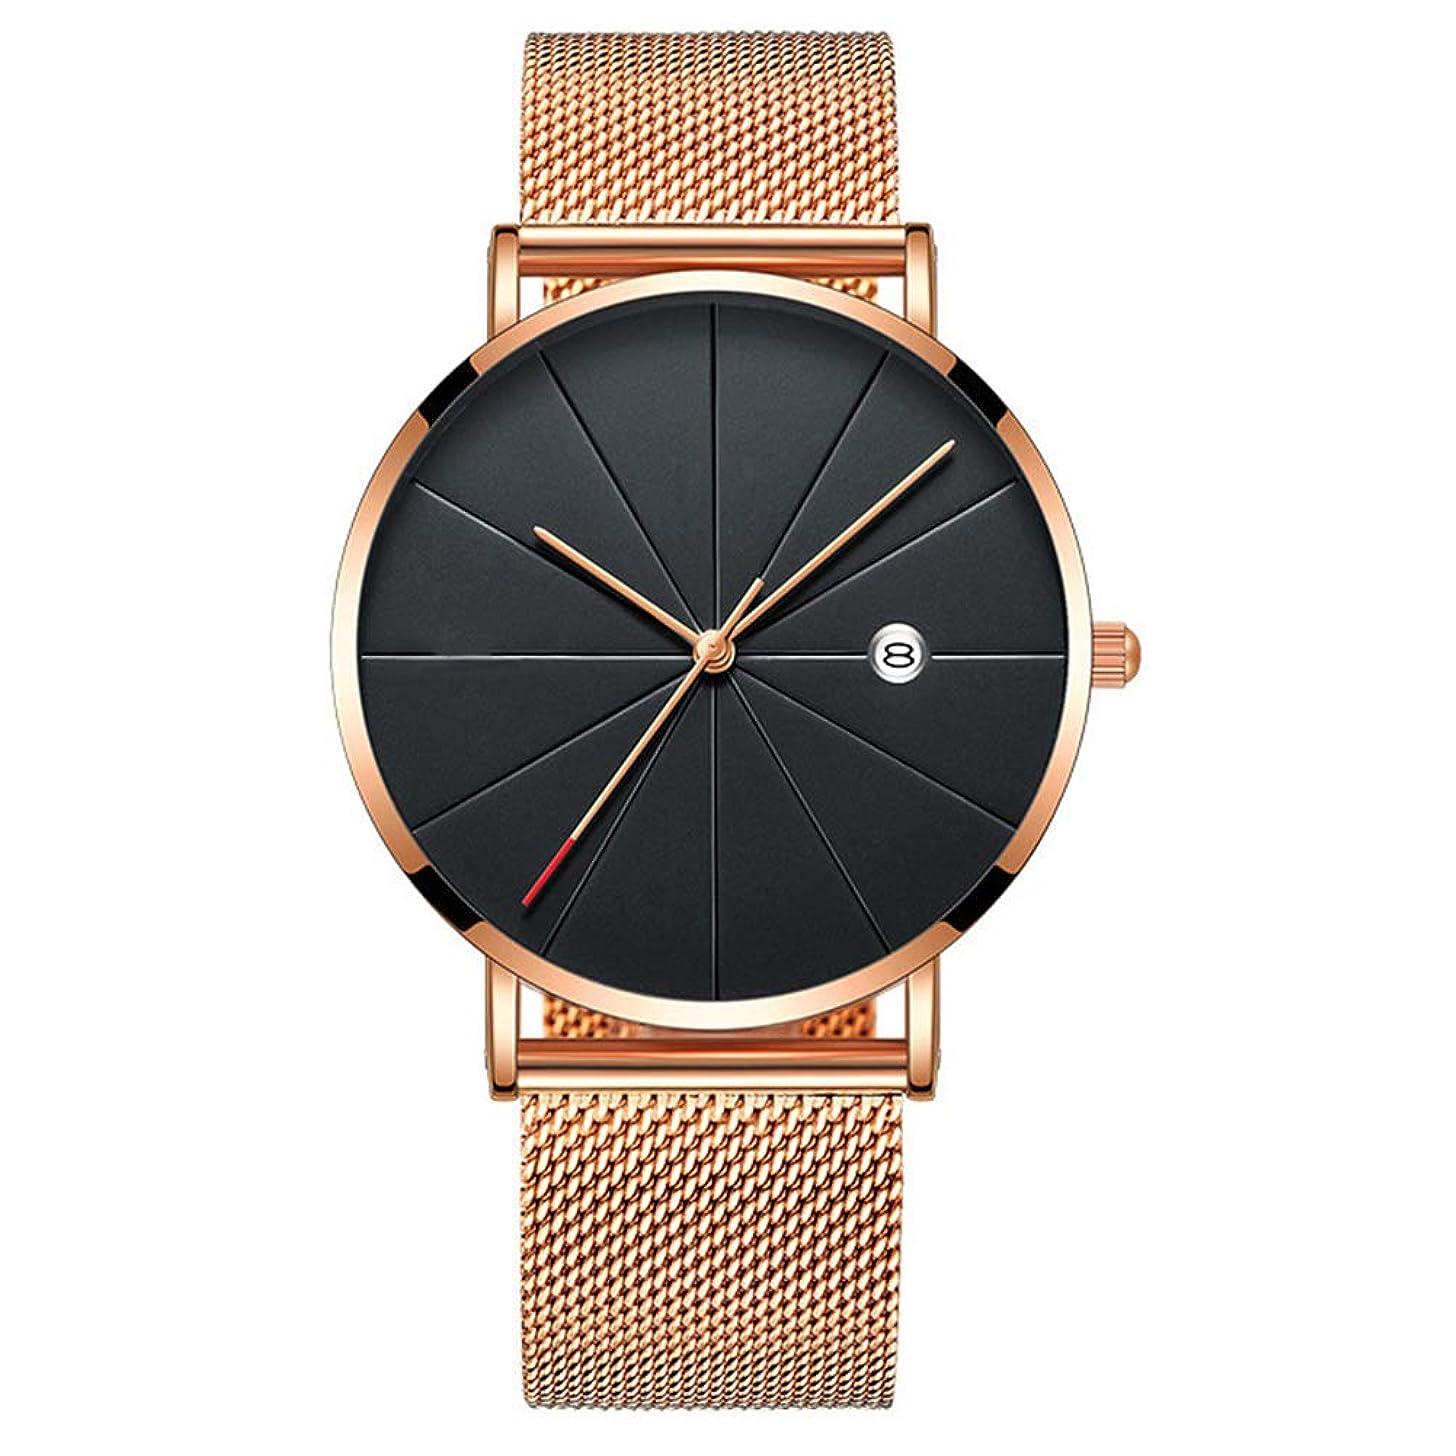 lightclub Casual Sports Men Stainless Steel Strap Round Dial Analog Quartz Wrist Watch for Women Men Black + Rose Gold